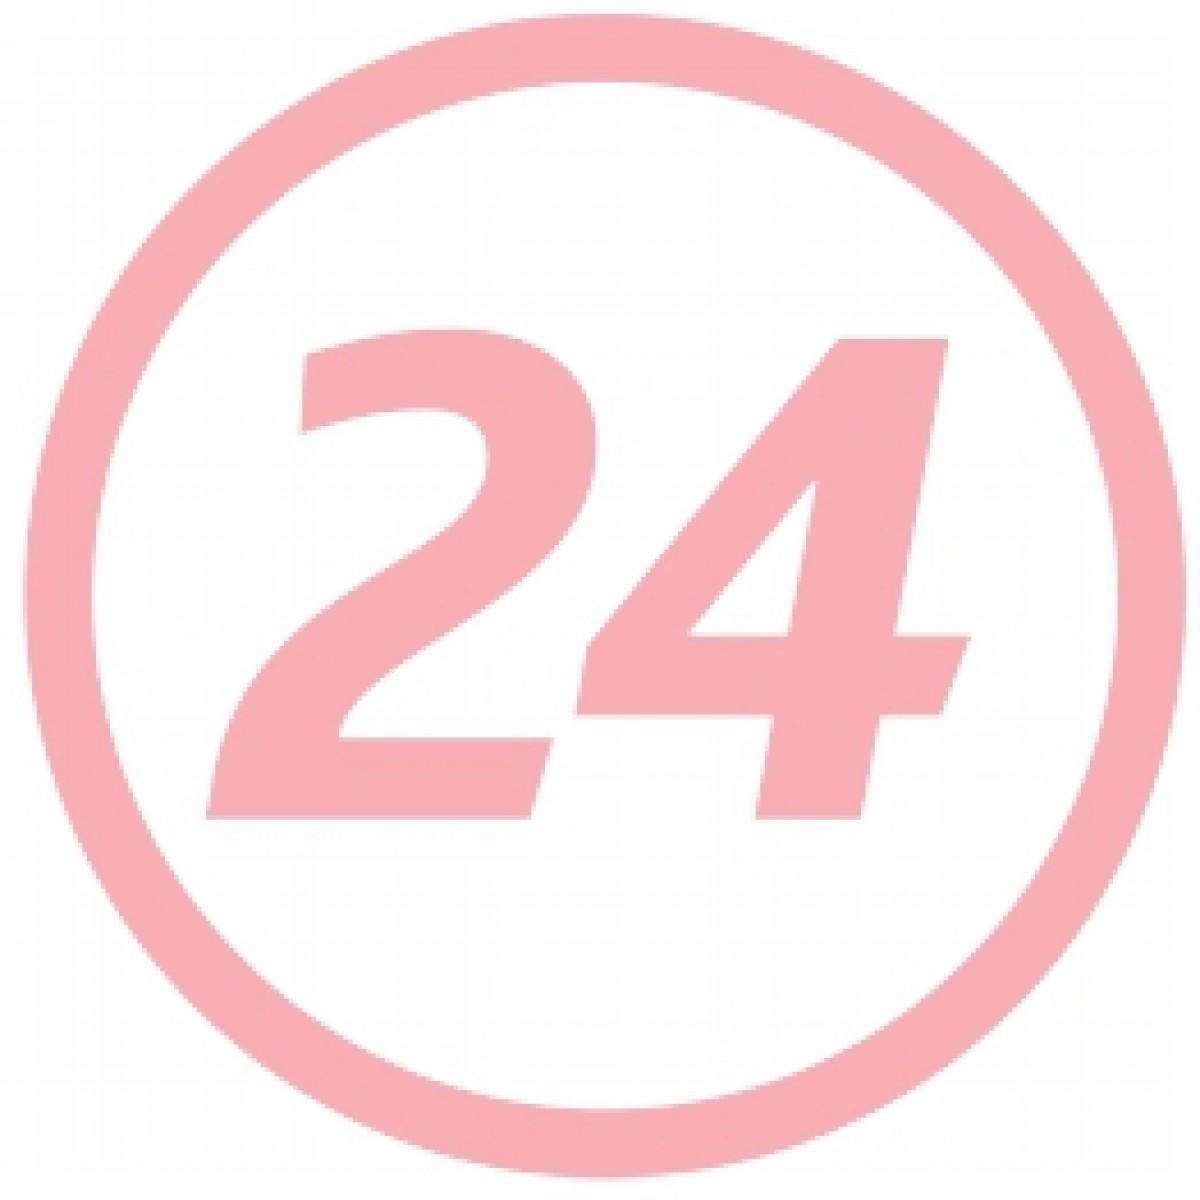 Emiplant Skin Repair Crema De Zi SPF15 Anti-Imbatranire Si Fermitate, Crema, 50ml